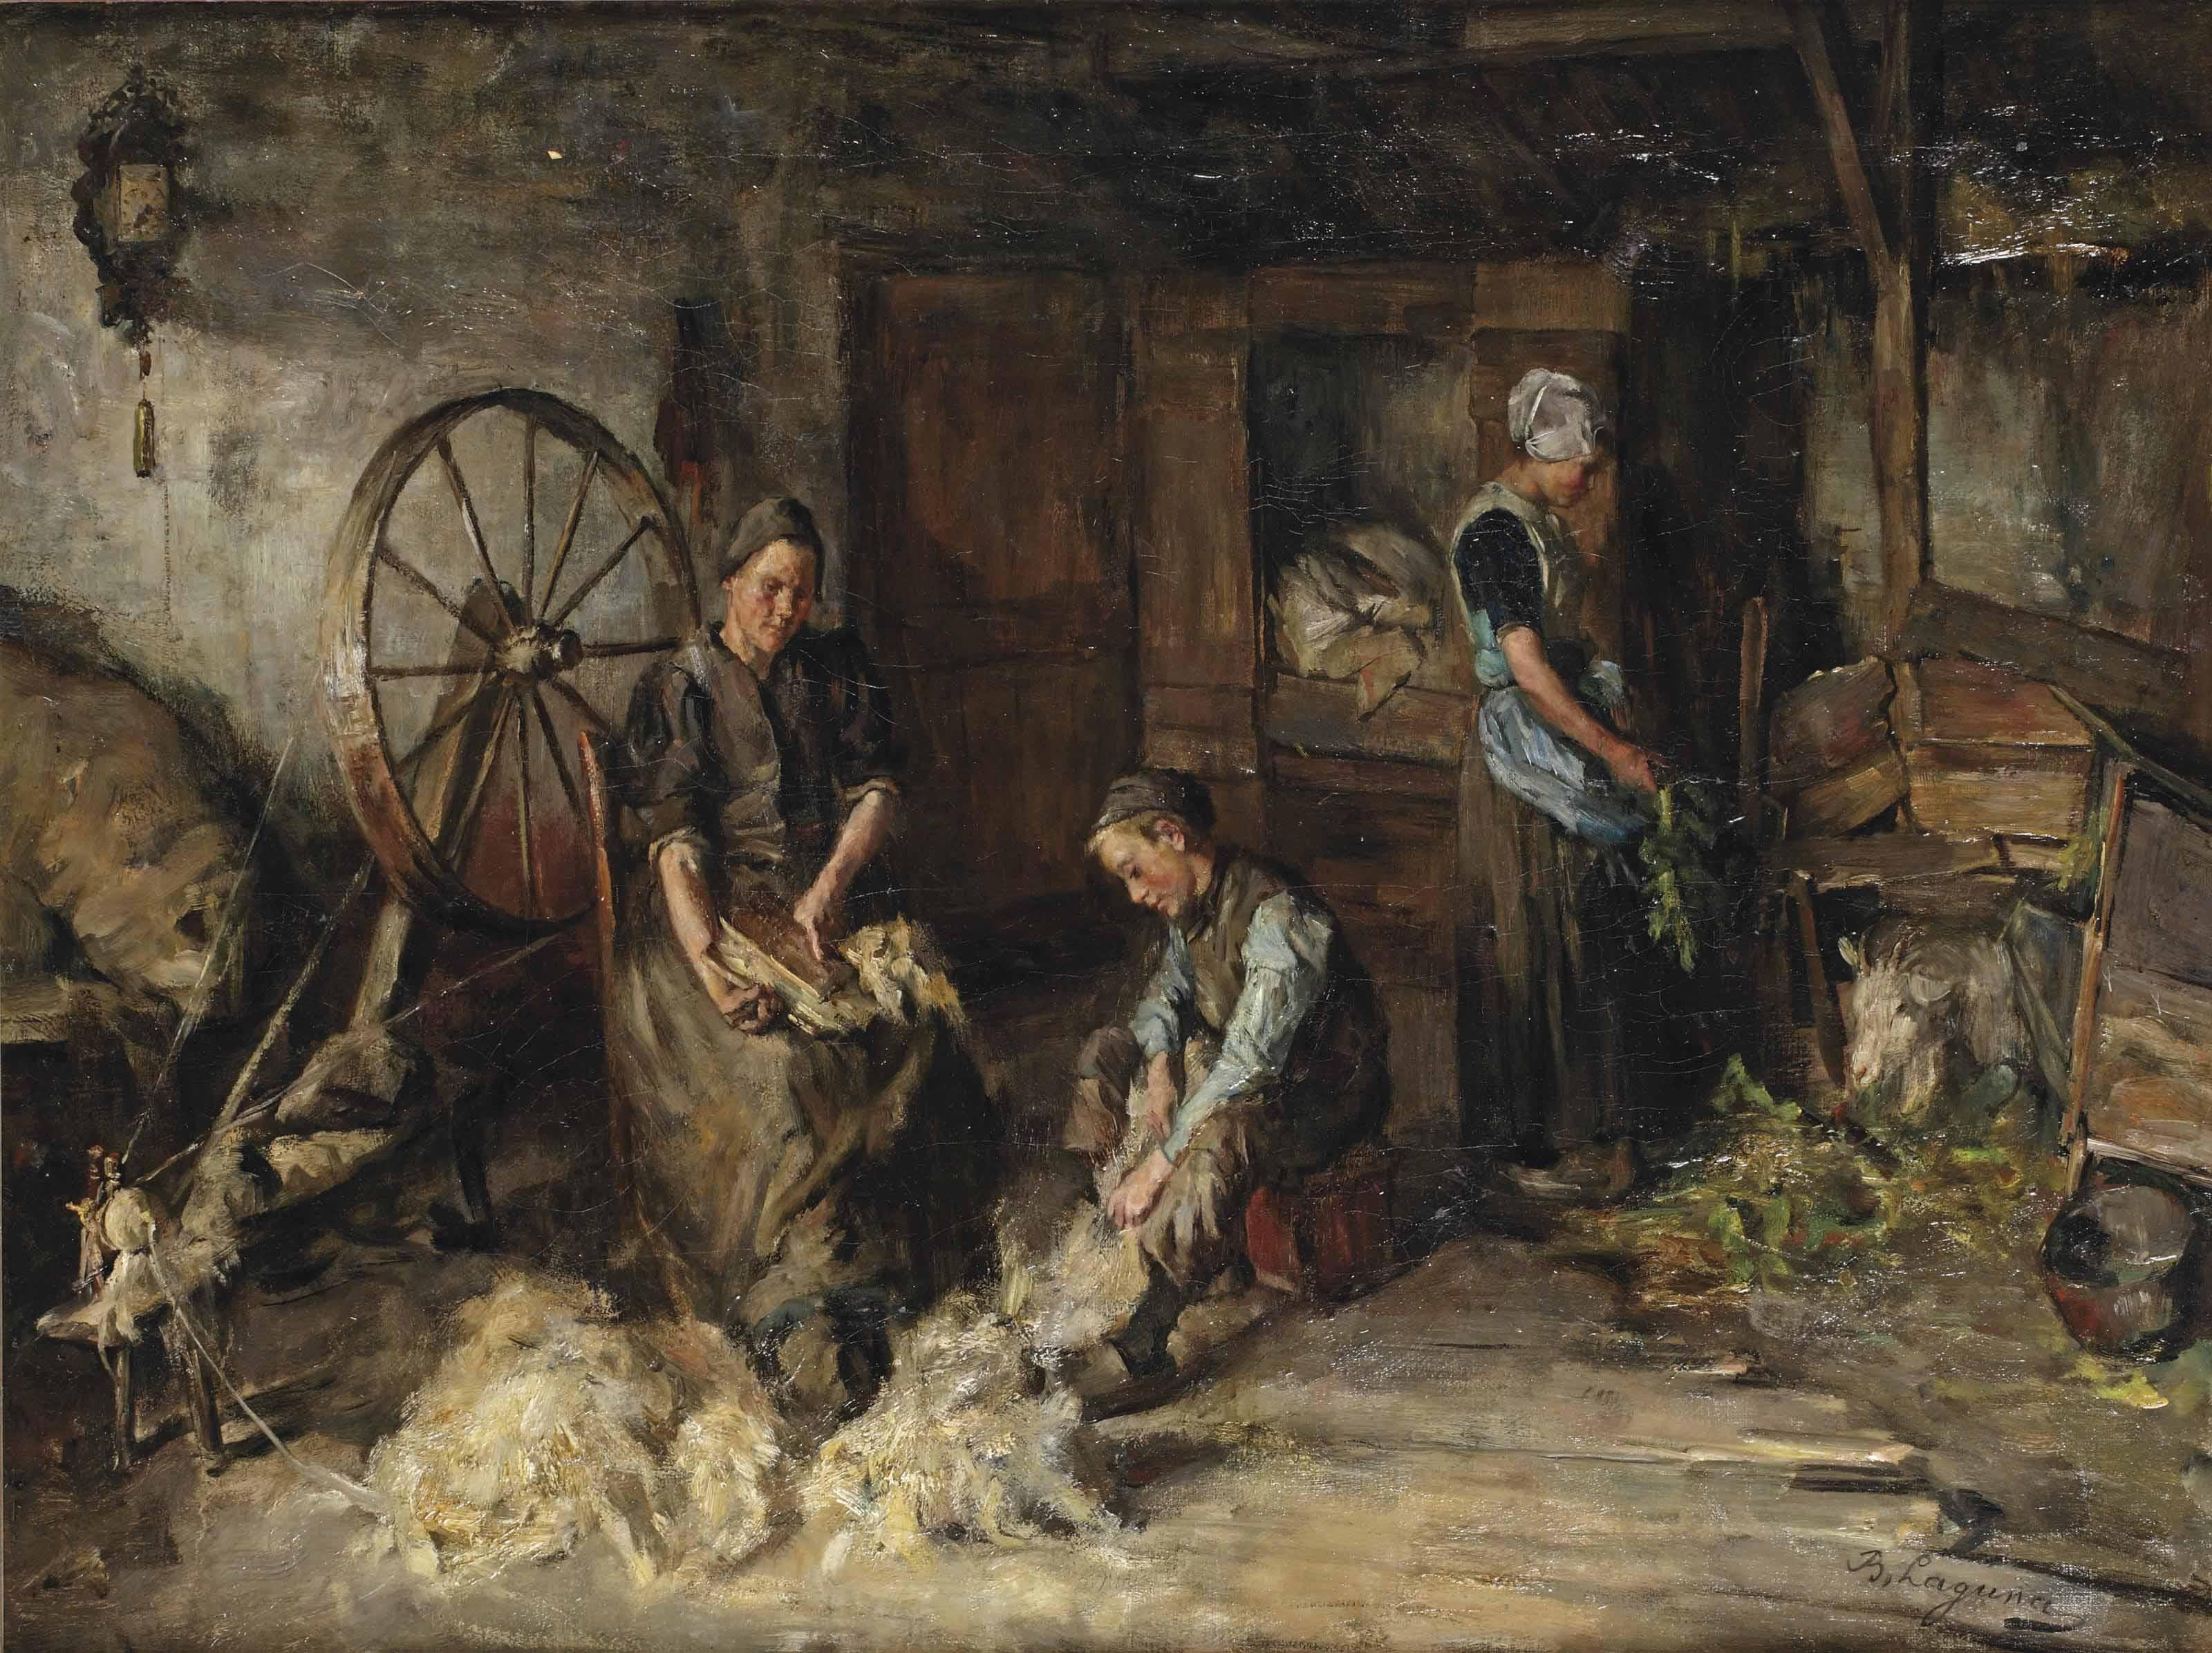 Daily activities around the spinning wheel